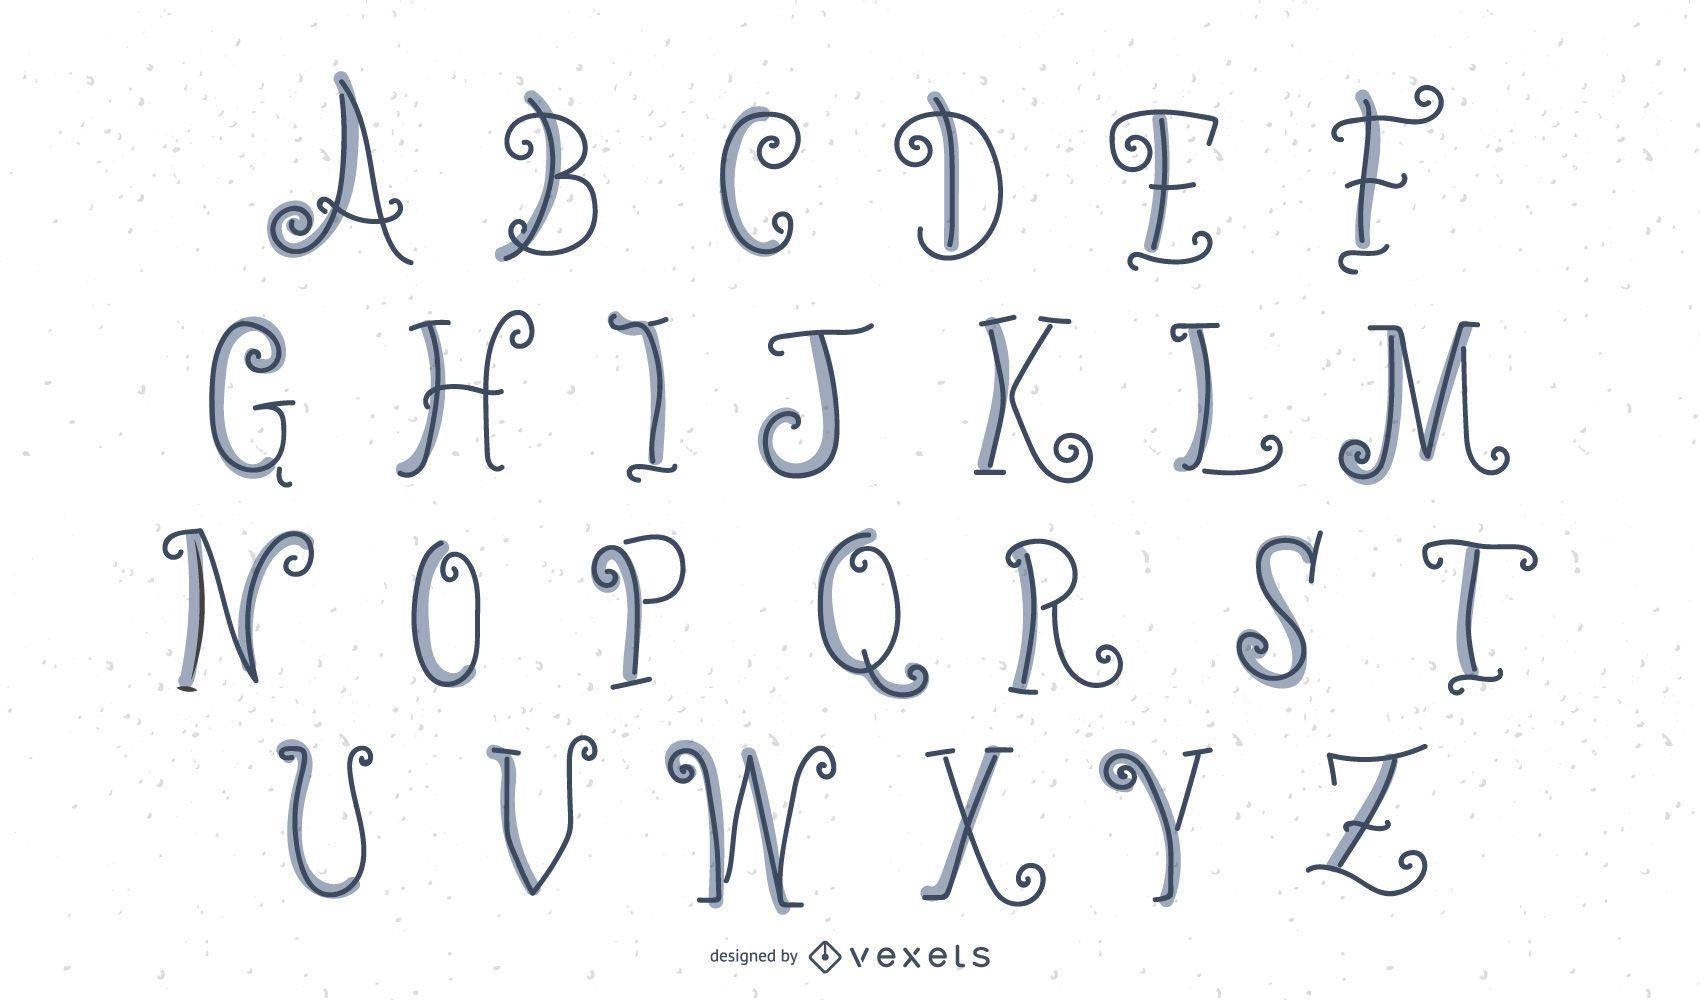 Letras do alfabeto de barbatanas de peixe